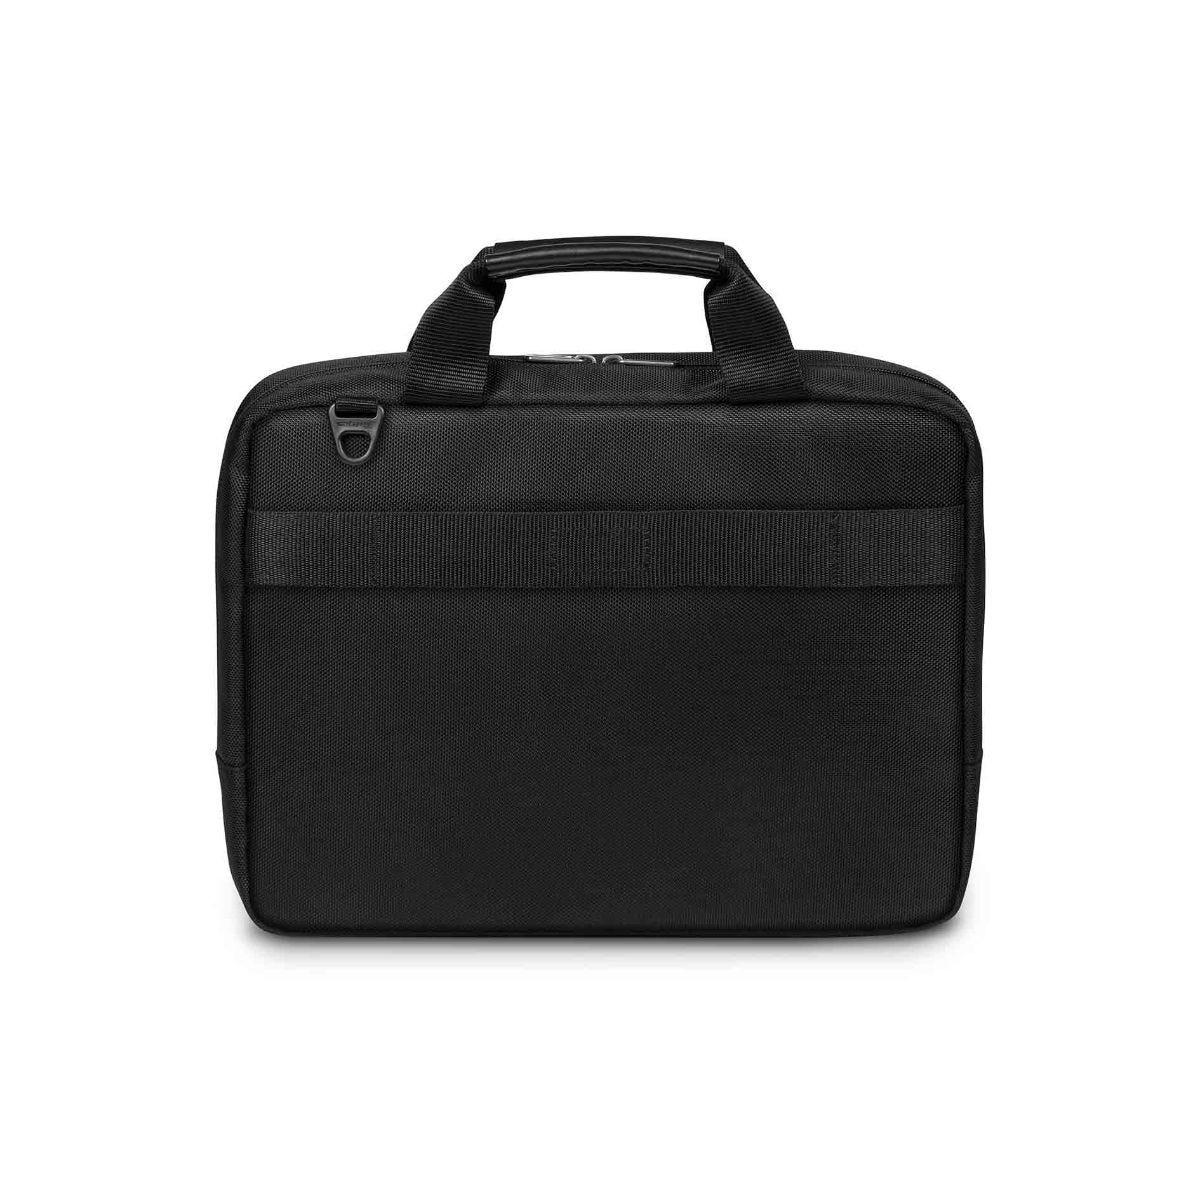 Image of Targus CitySmart Slimline Topload Laptop Case 14 Inch, Black/Grey